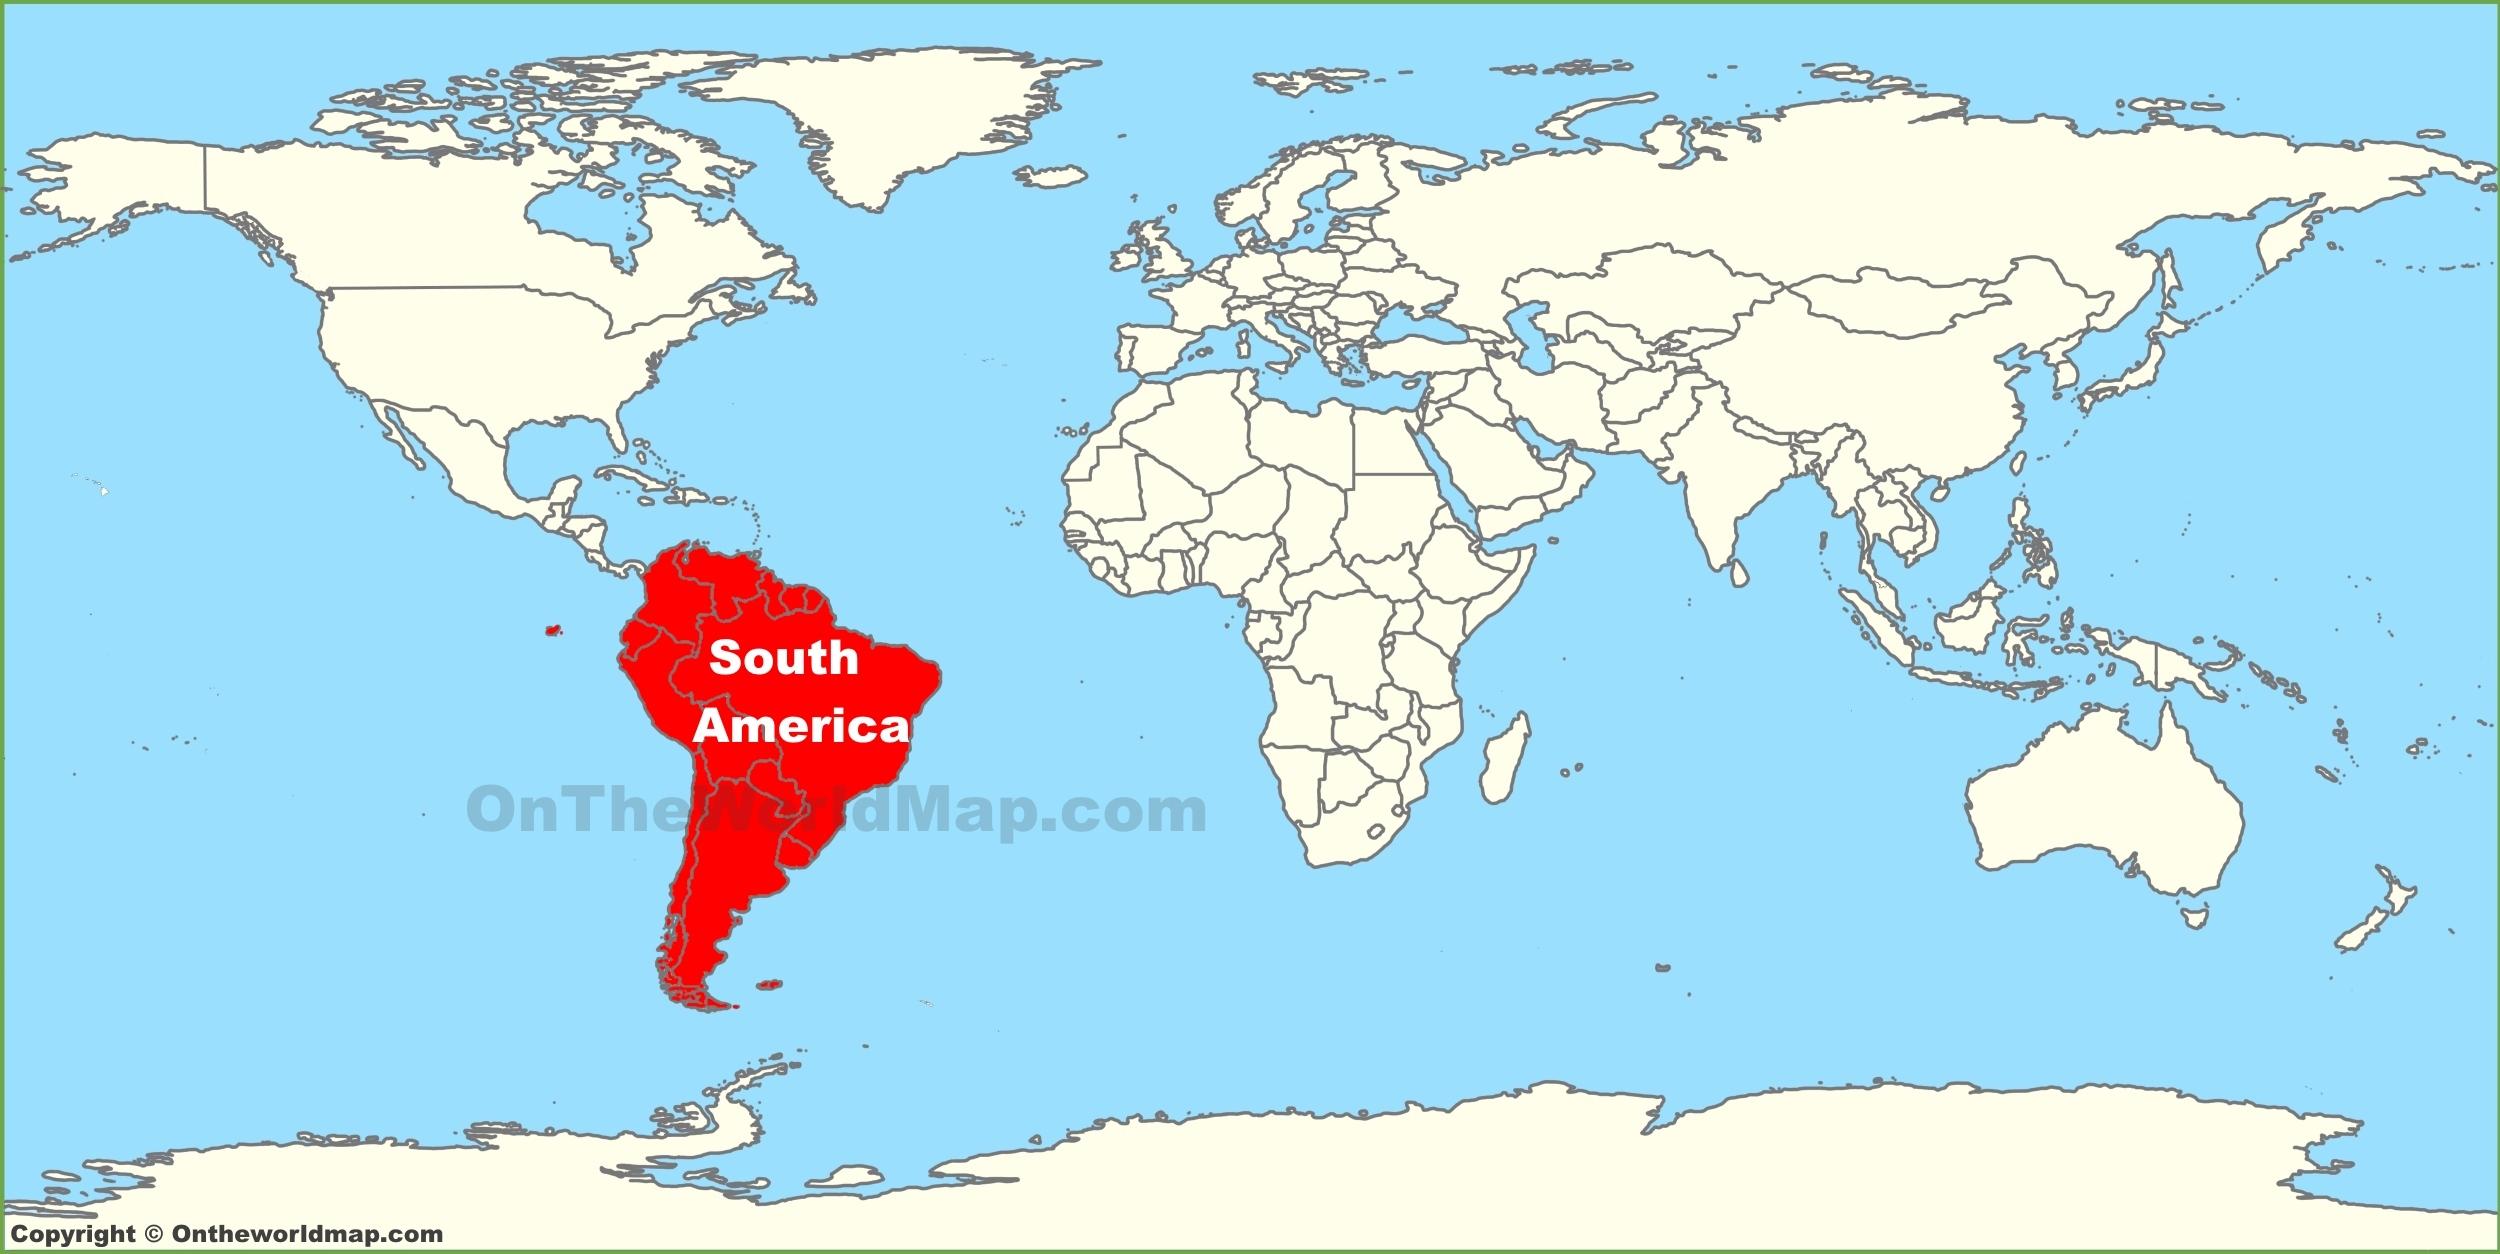 World Map South America South America location on the World Map World Map South America